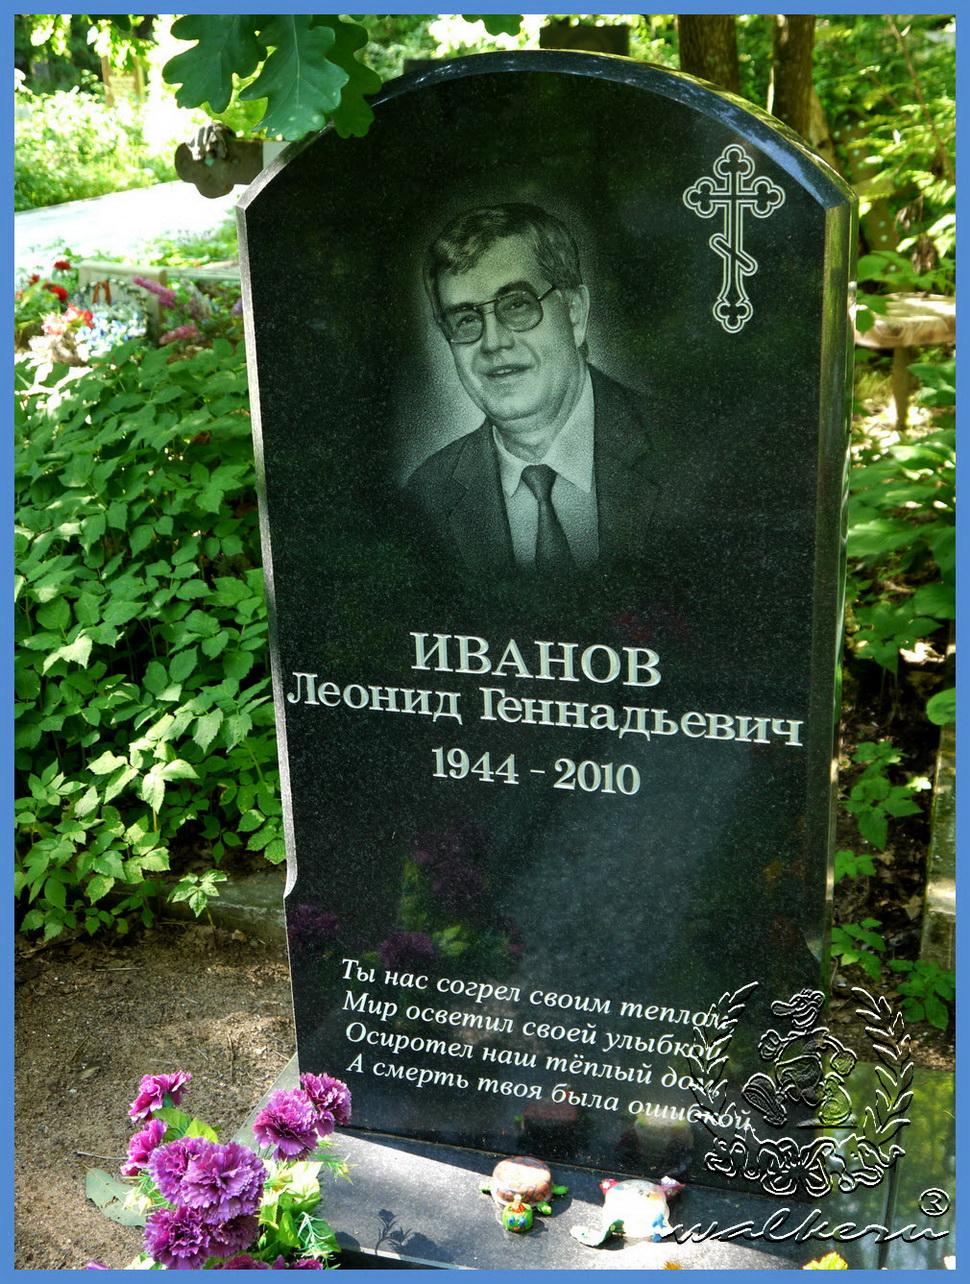 Могила Иванова Л.Г. на Северном кладбище